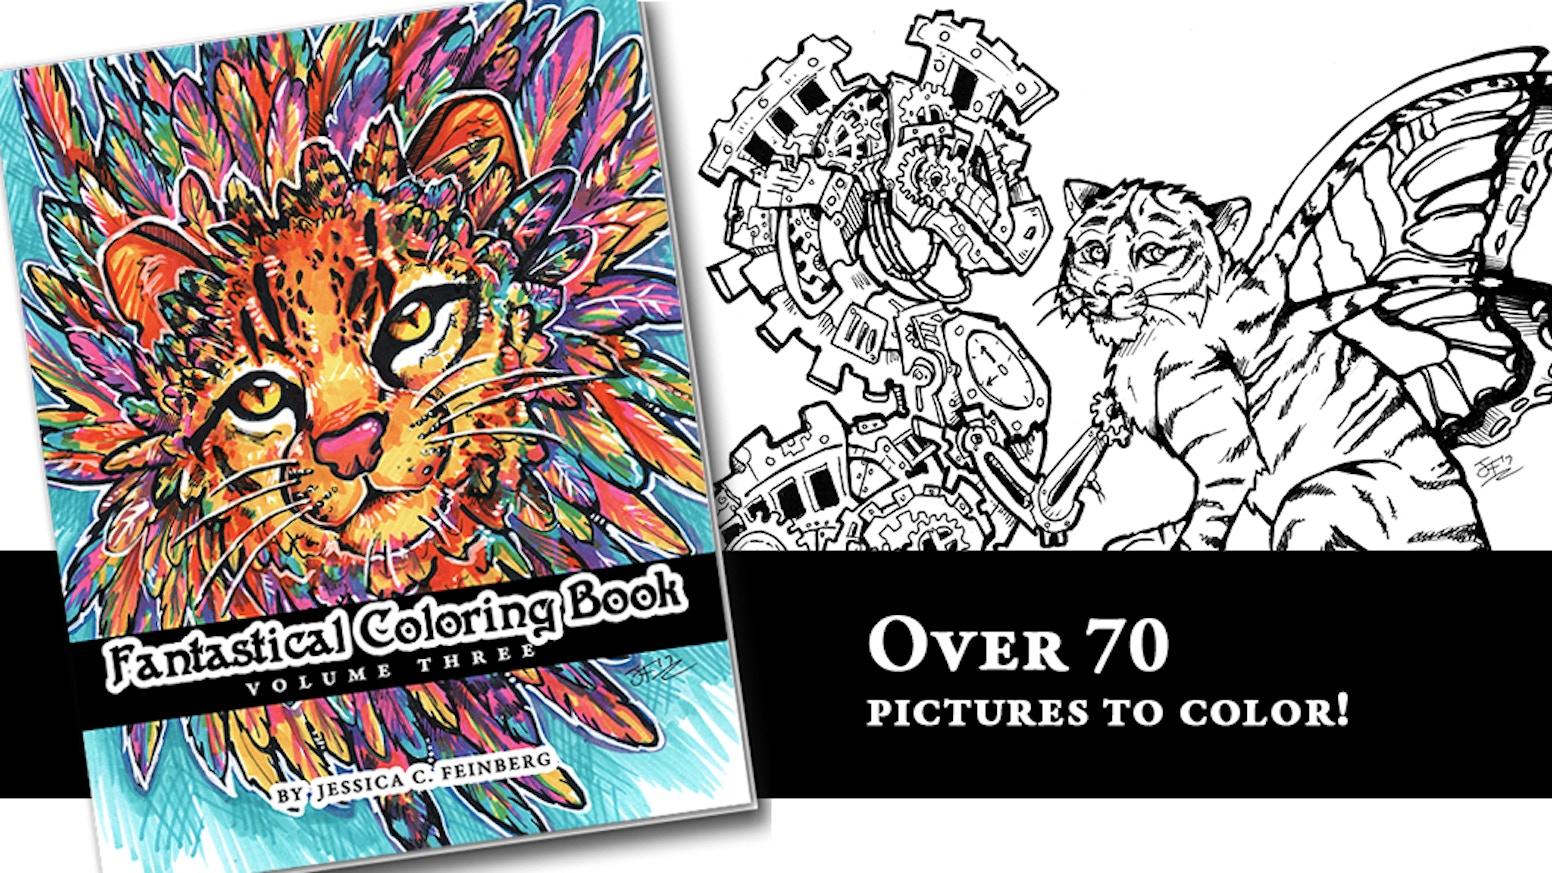 Fantastical Coloring Book 3